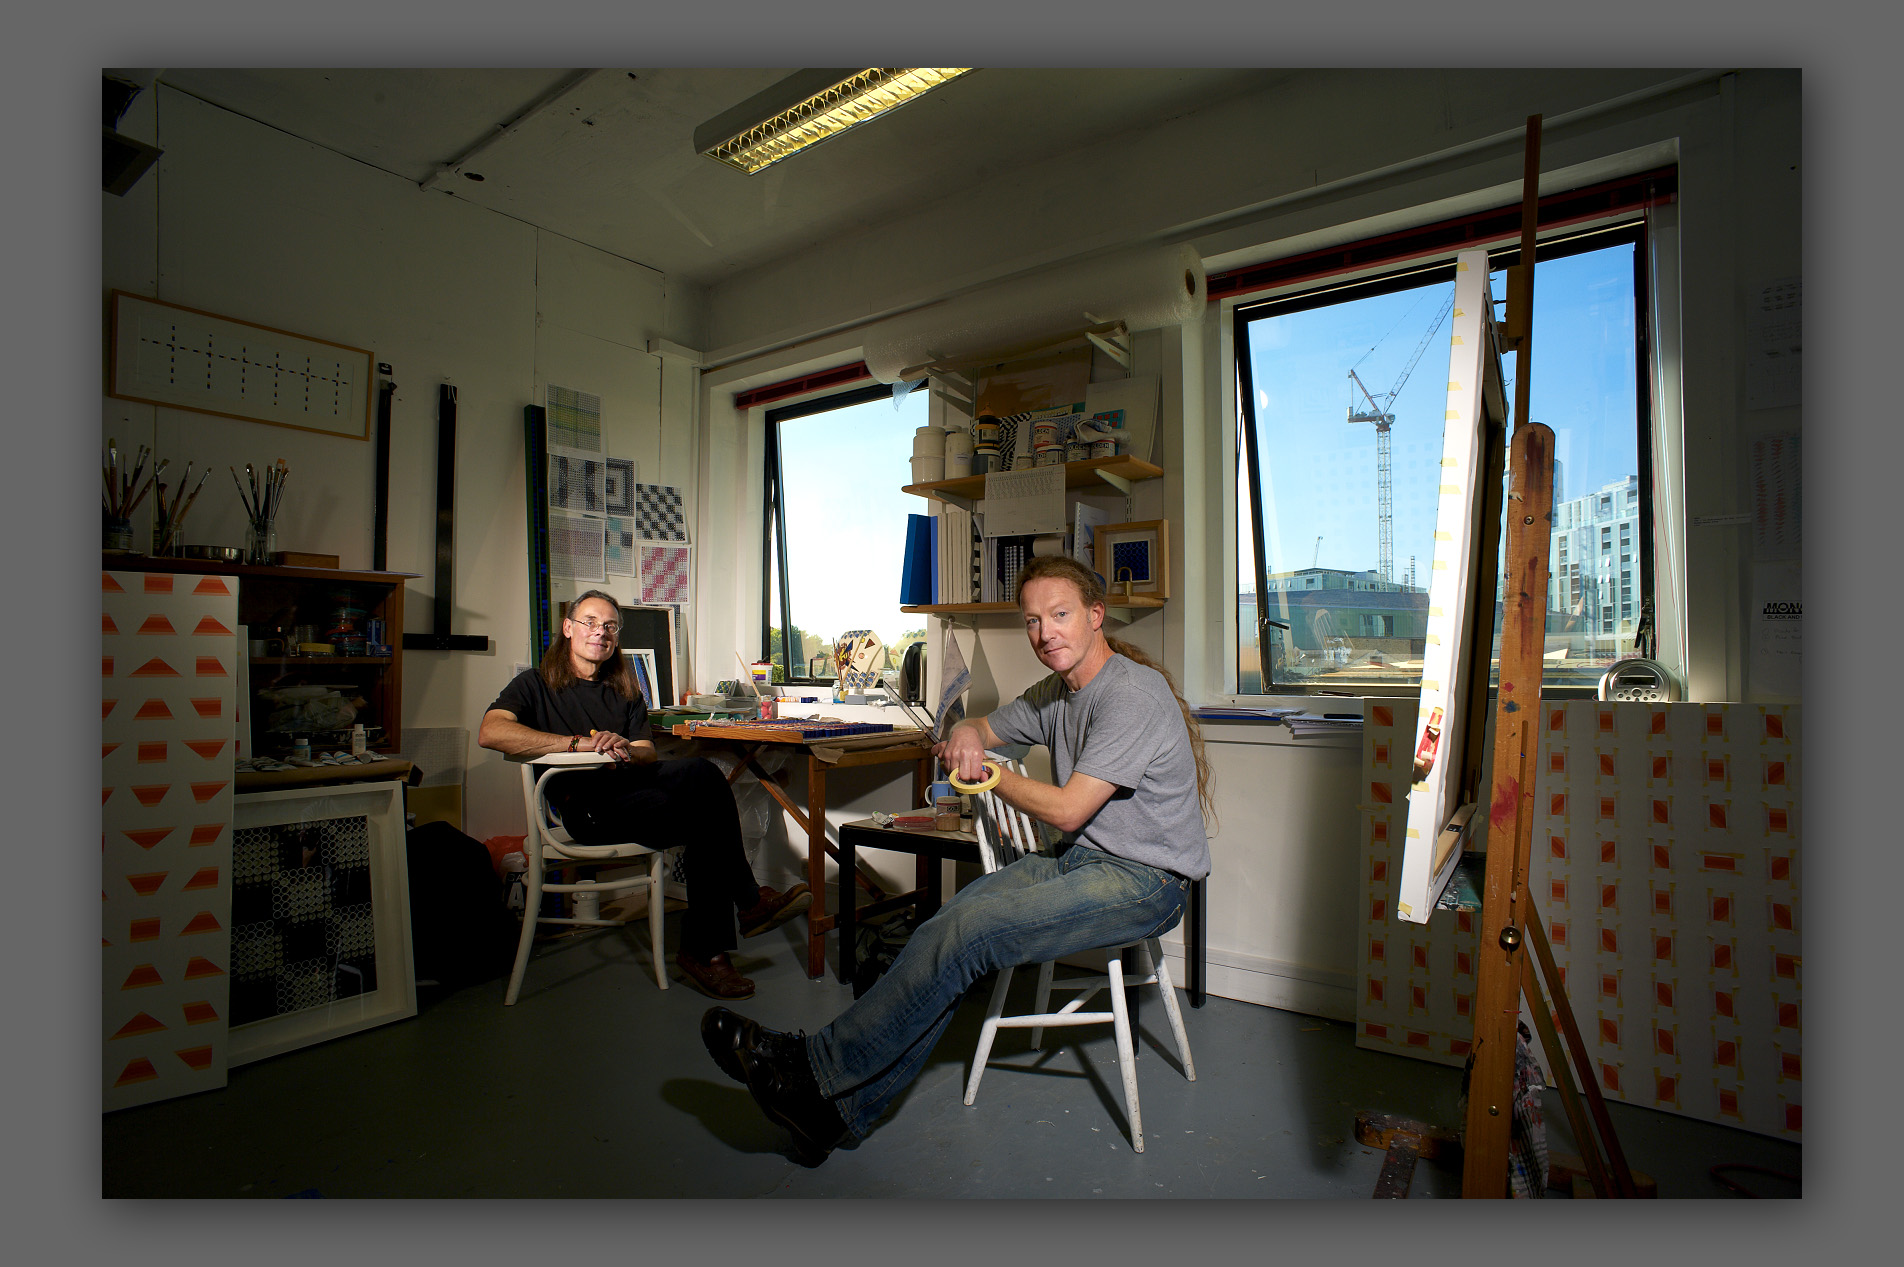 Patrick Morrissey and Clive Hans